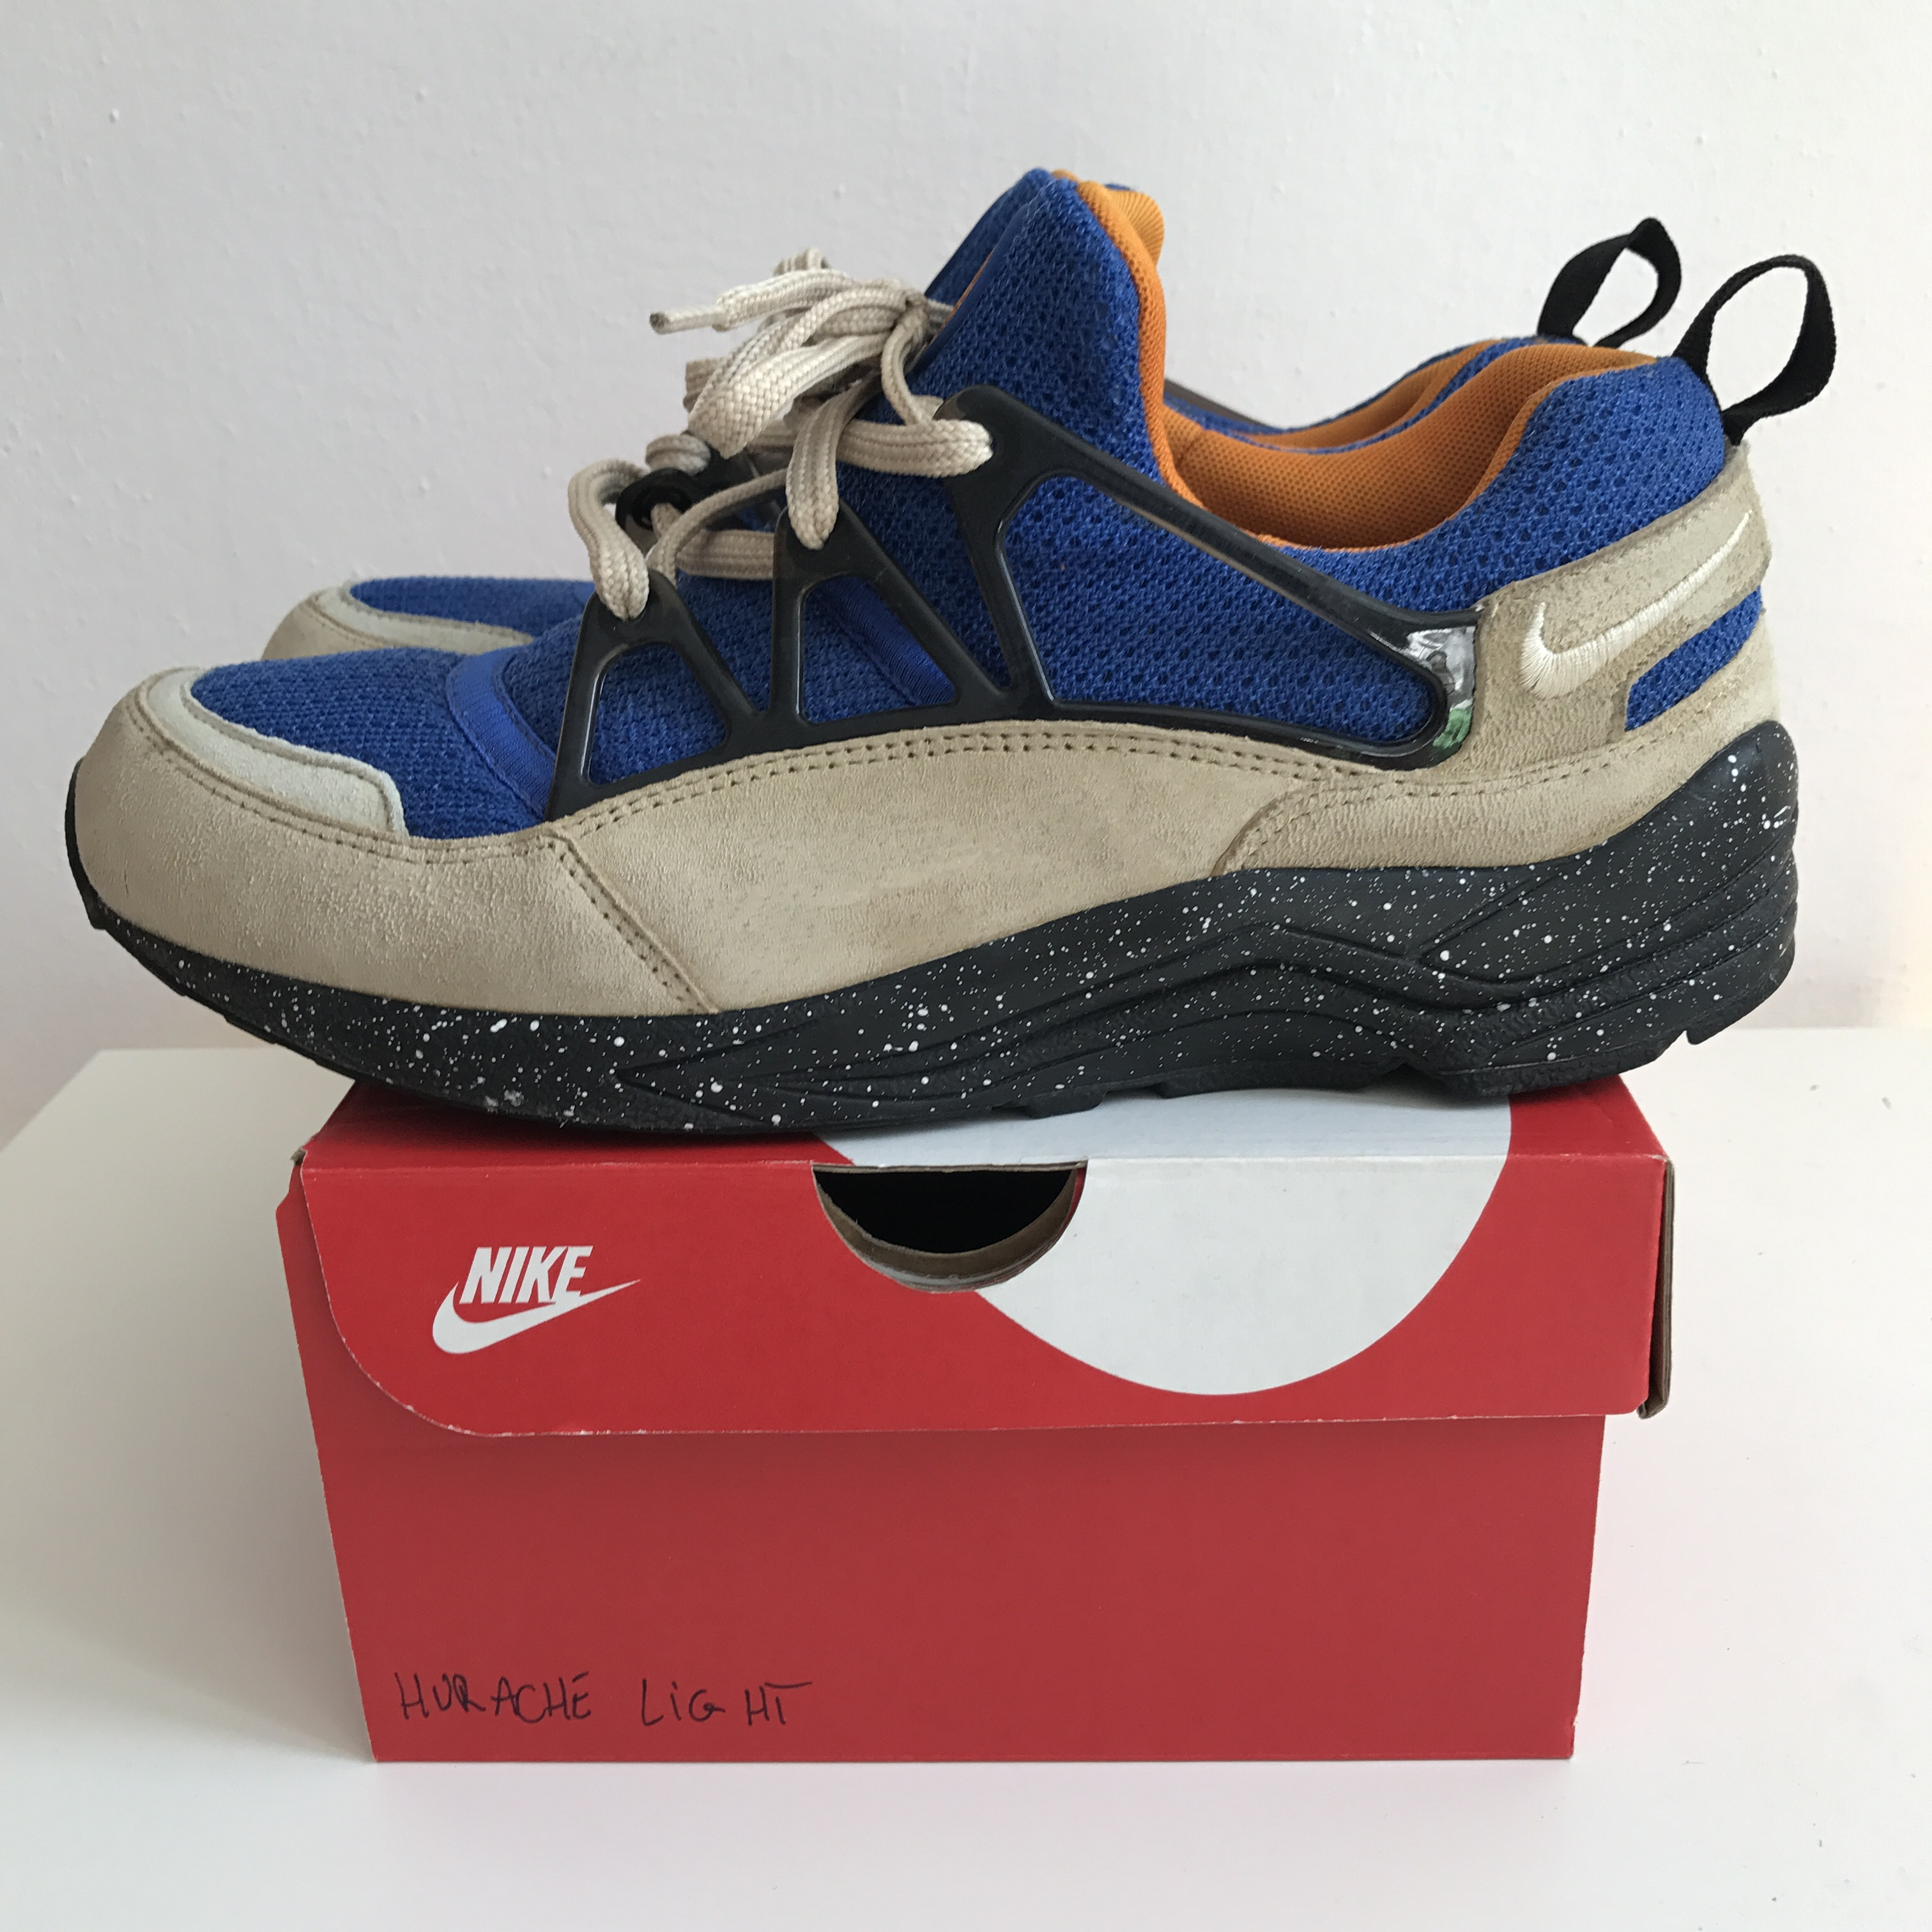 save off ee9e1 94642 Nike Nike Air Huarache Light Size Mowabb Us9 | Grailed